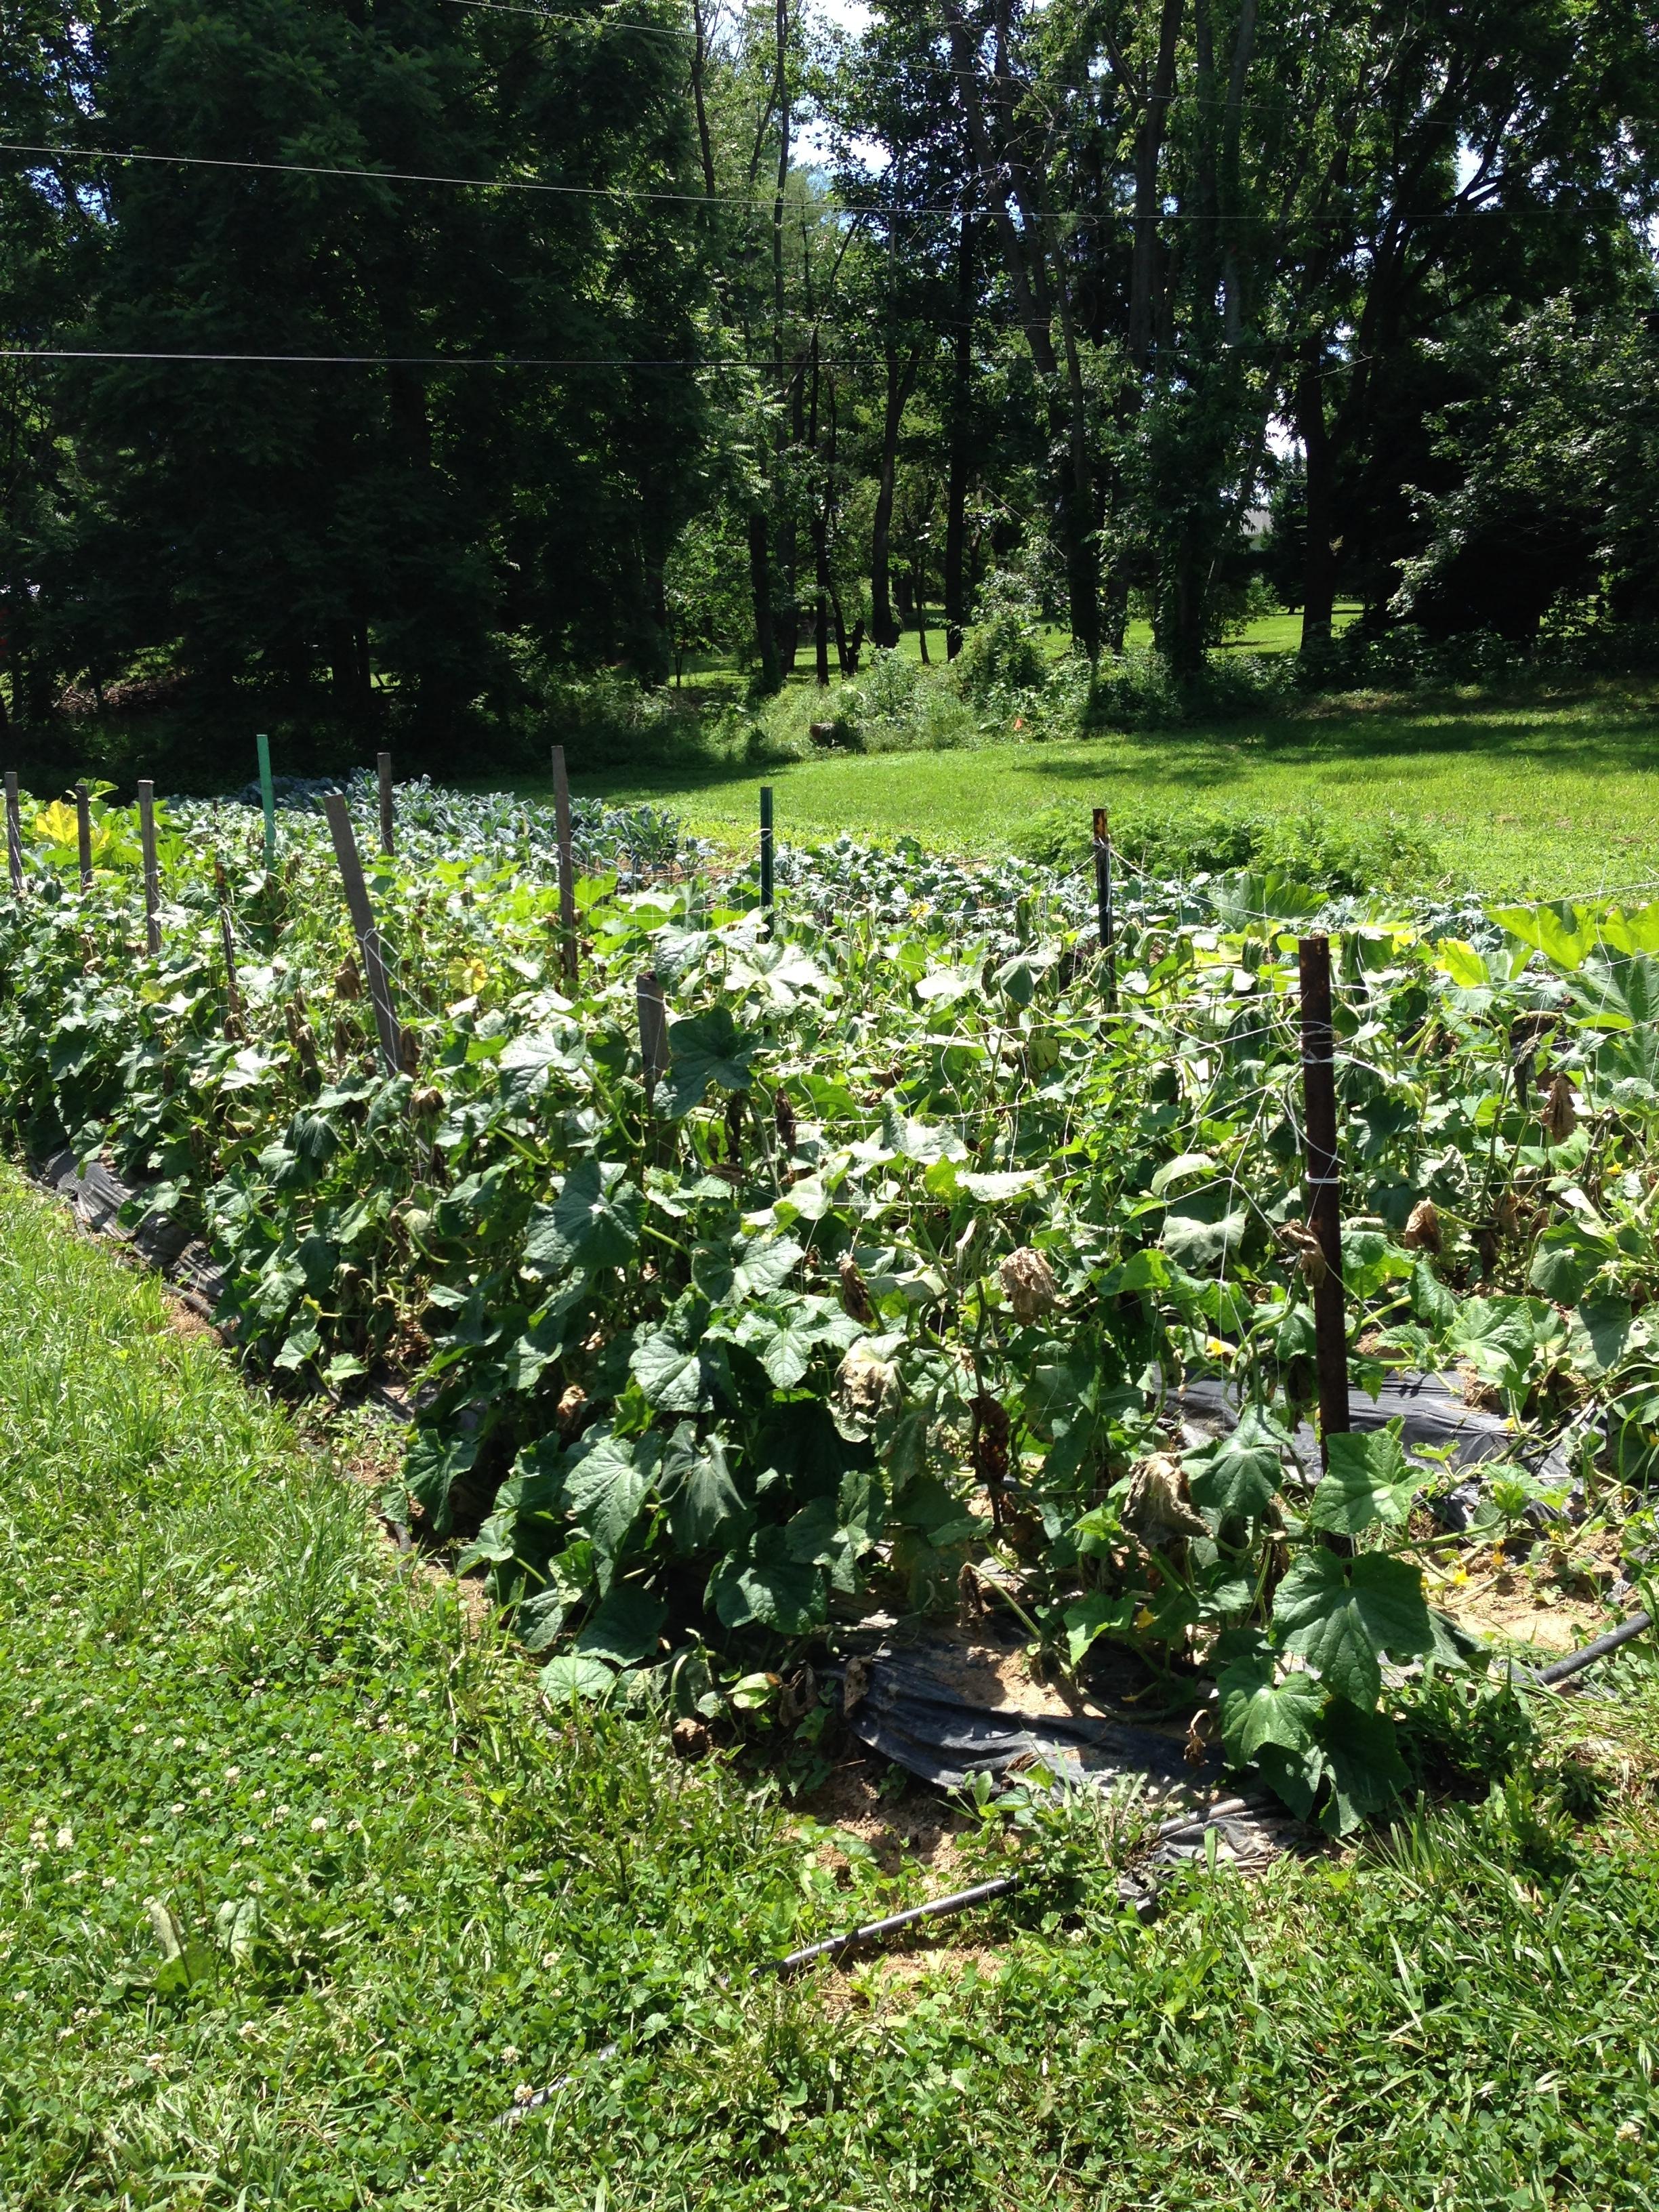 Cucumbers, squash, kale, etc. all basking in the sun!